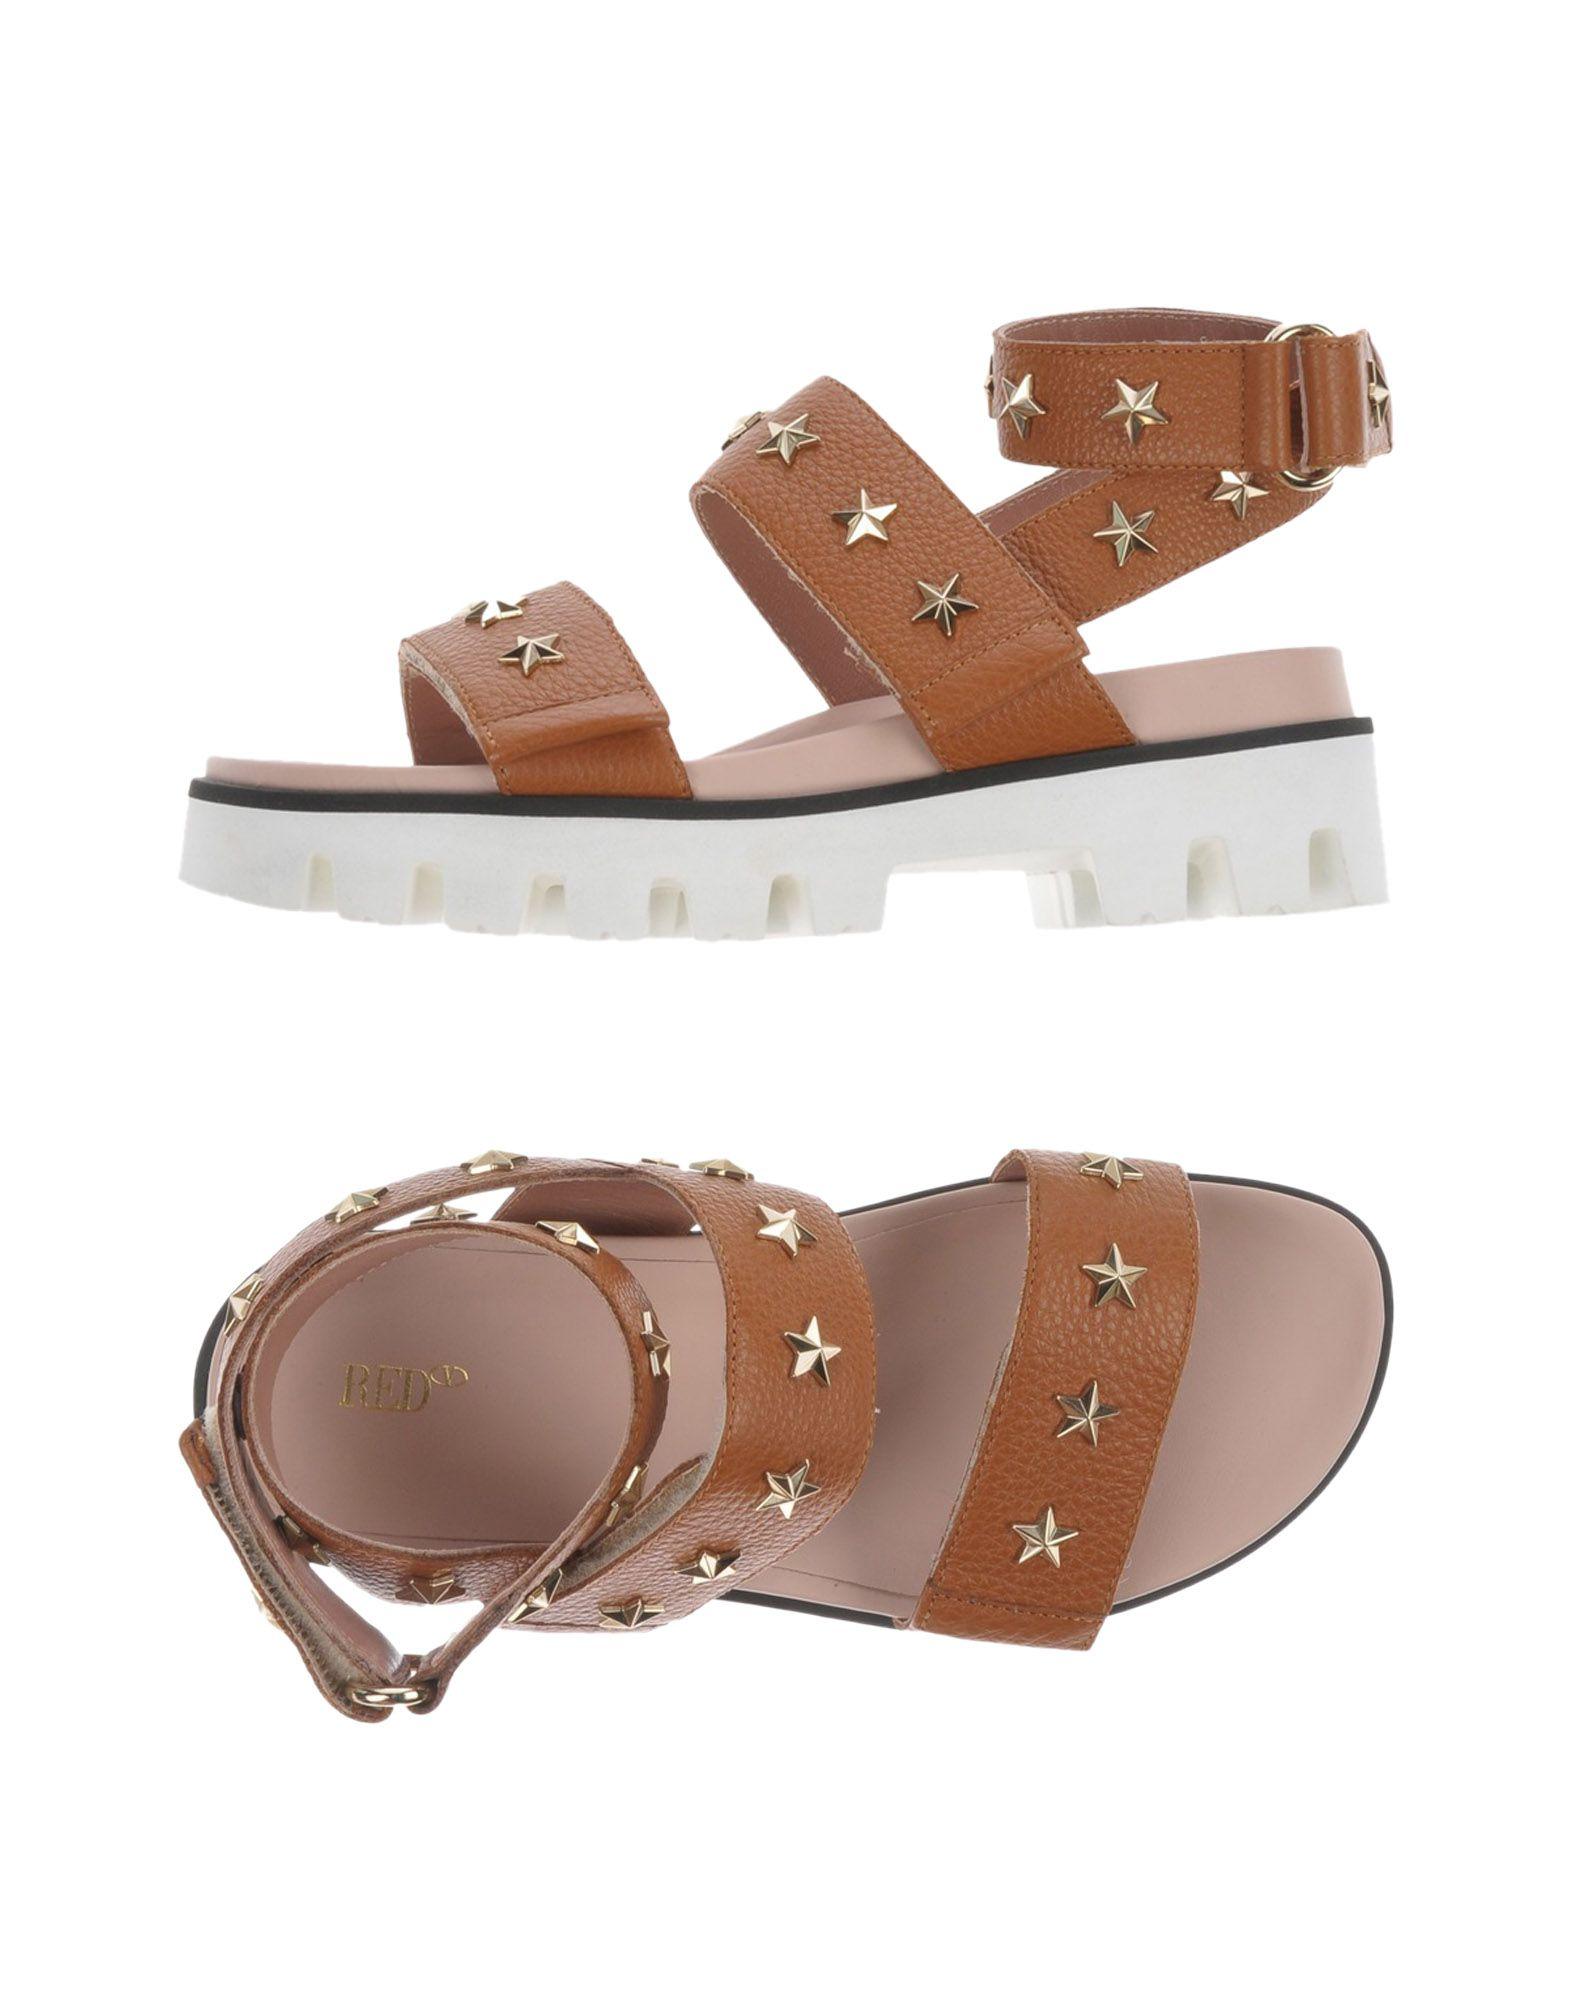 Haltbare Mode billige Schuhe Red(V) Sandalen Damen  11464978EK Heiße Schuhe